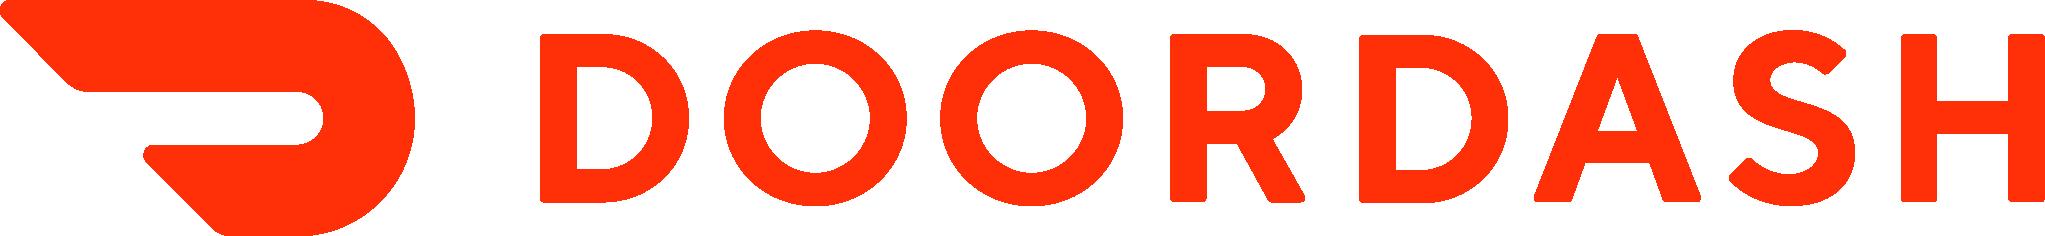 Door Dash logo RGB